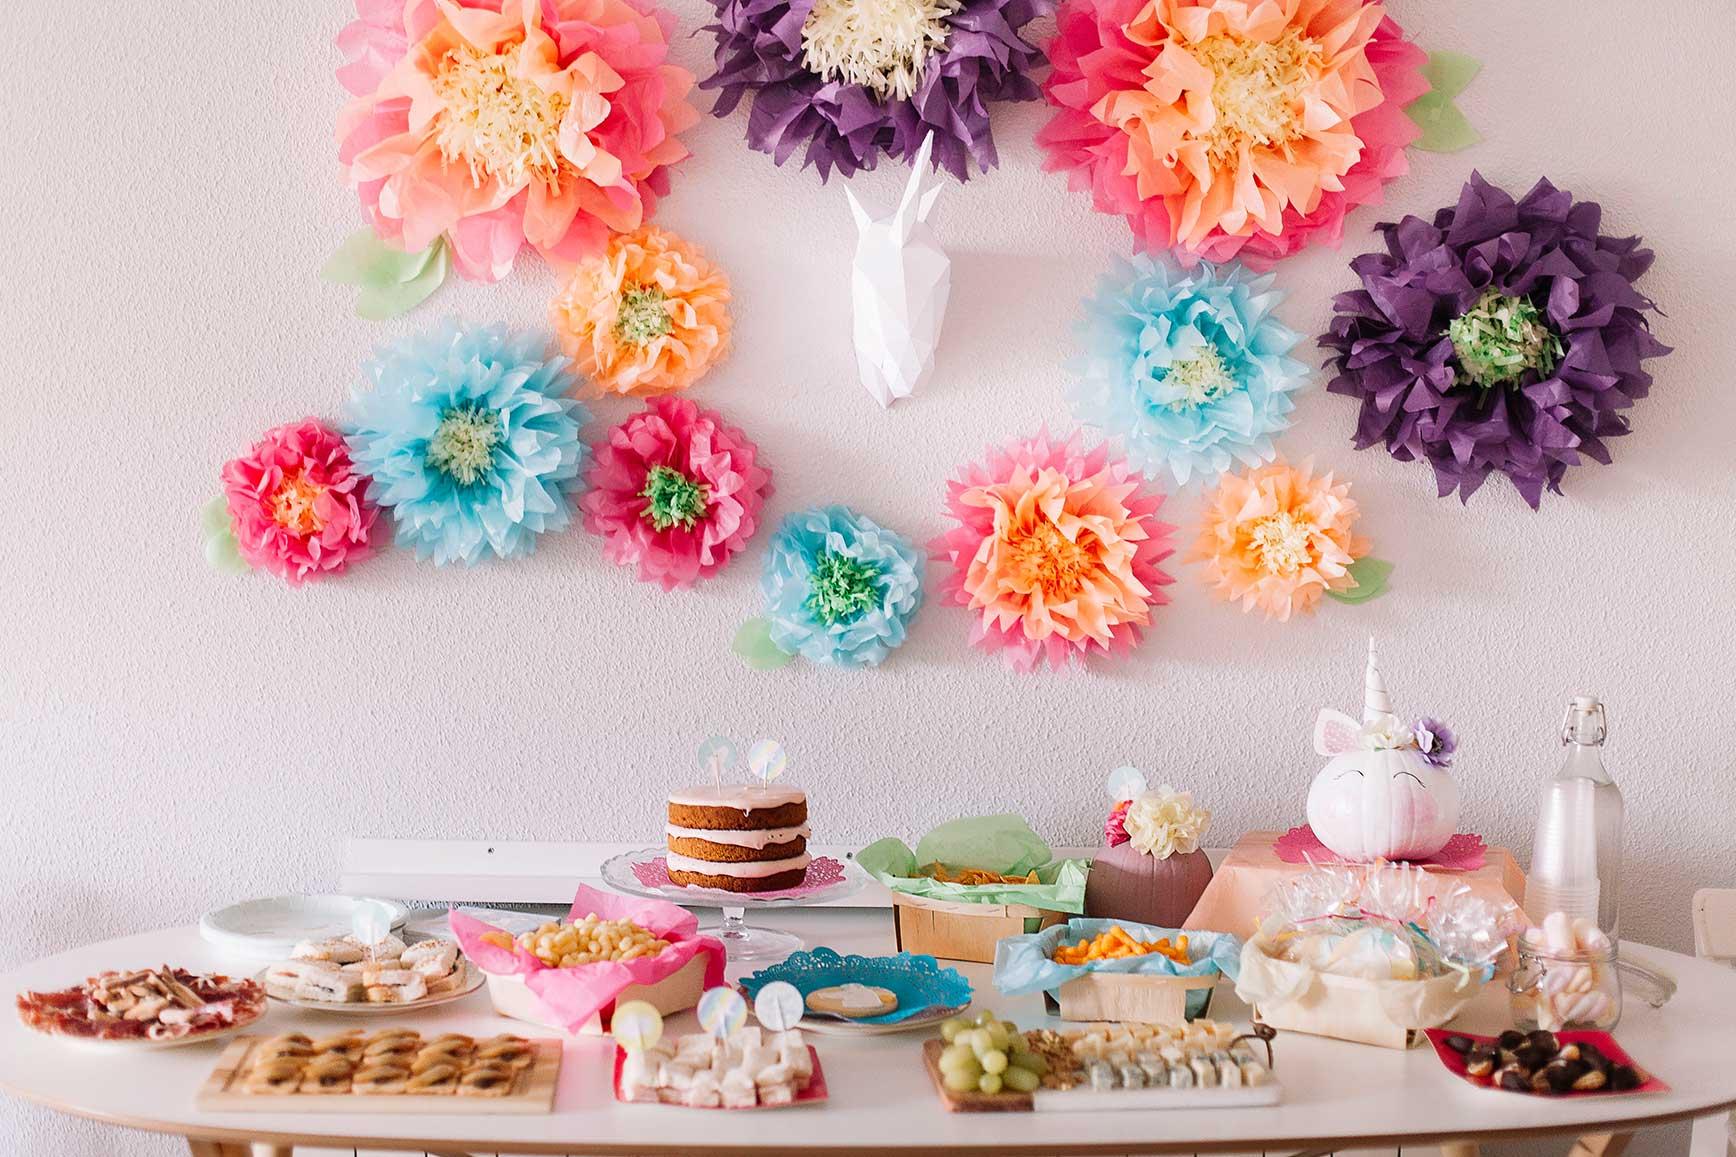 Fiesta de Unicornios - Unicorn Birthday Party 2